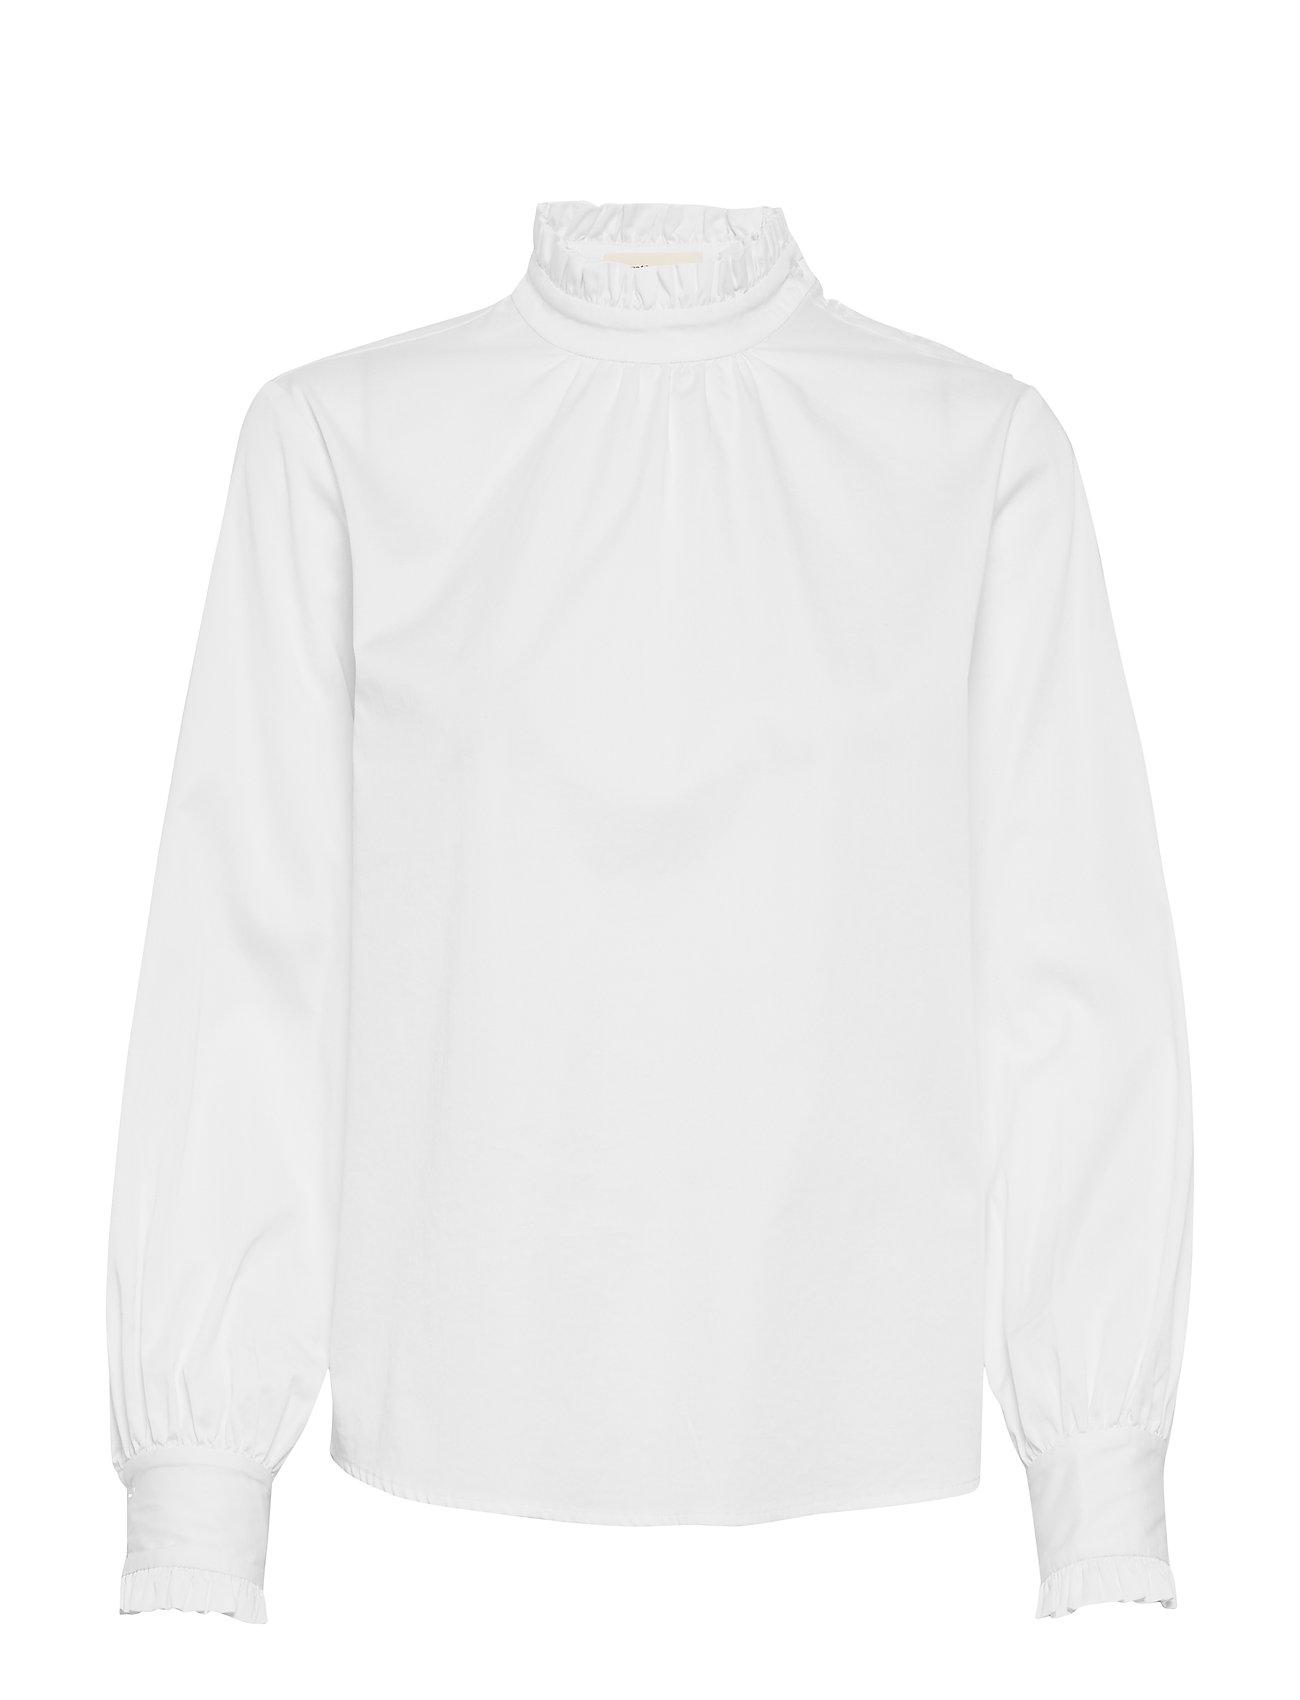 Levete Room LR-HINA - L100 - WHITE